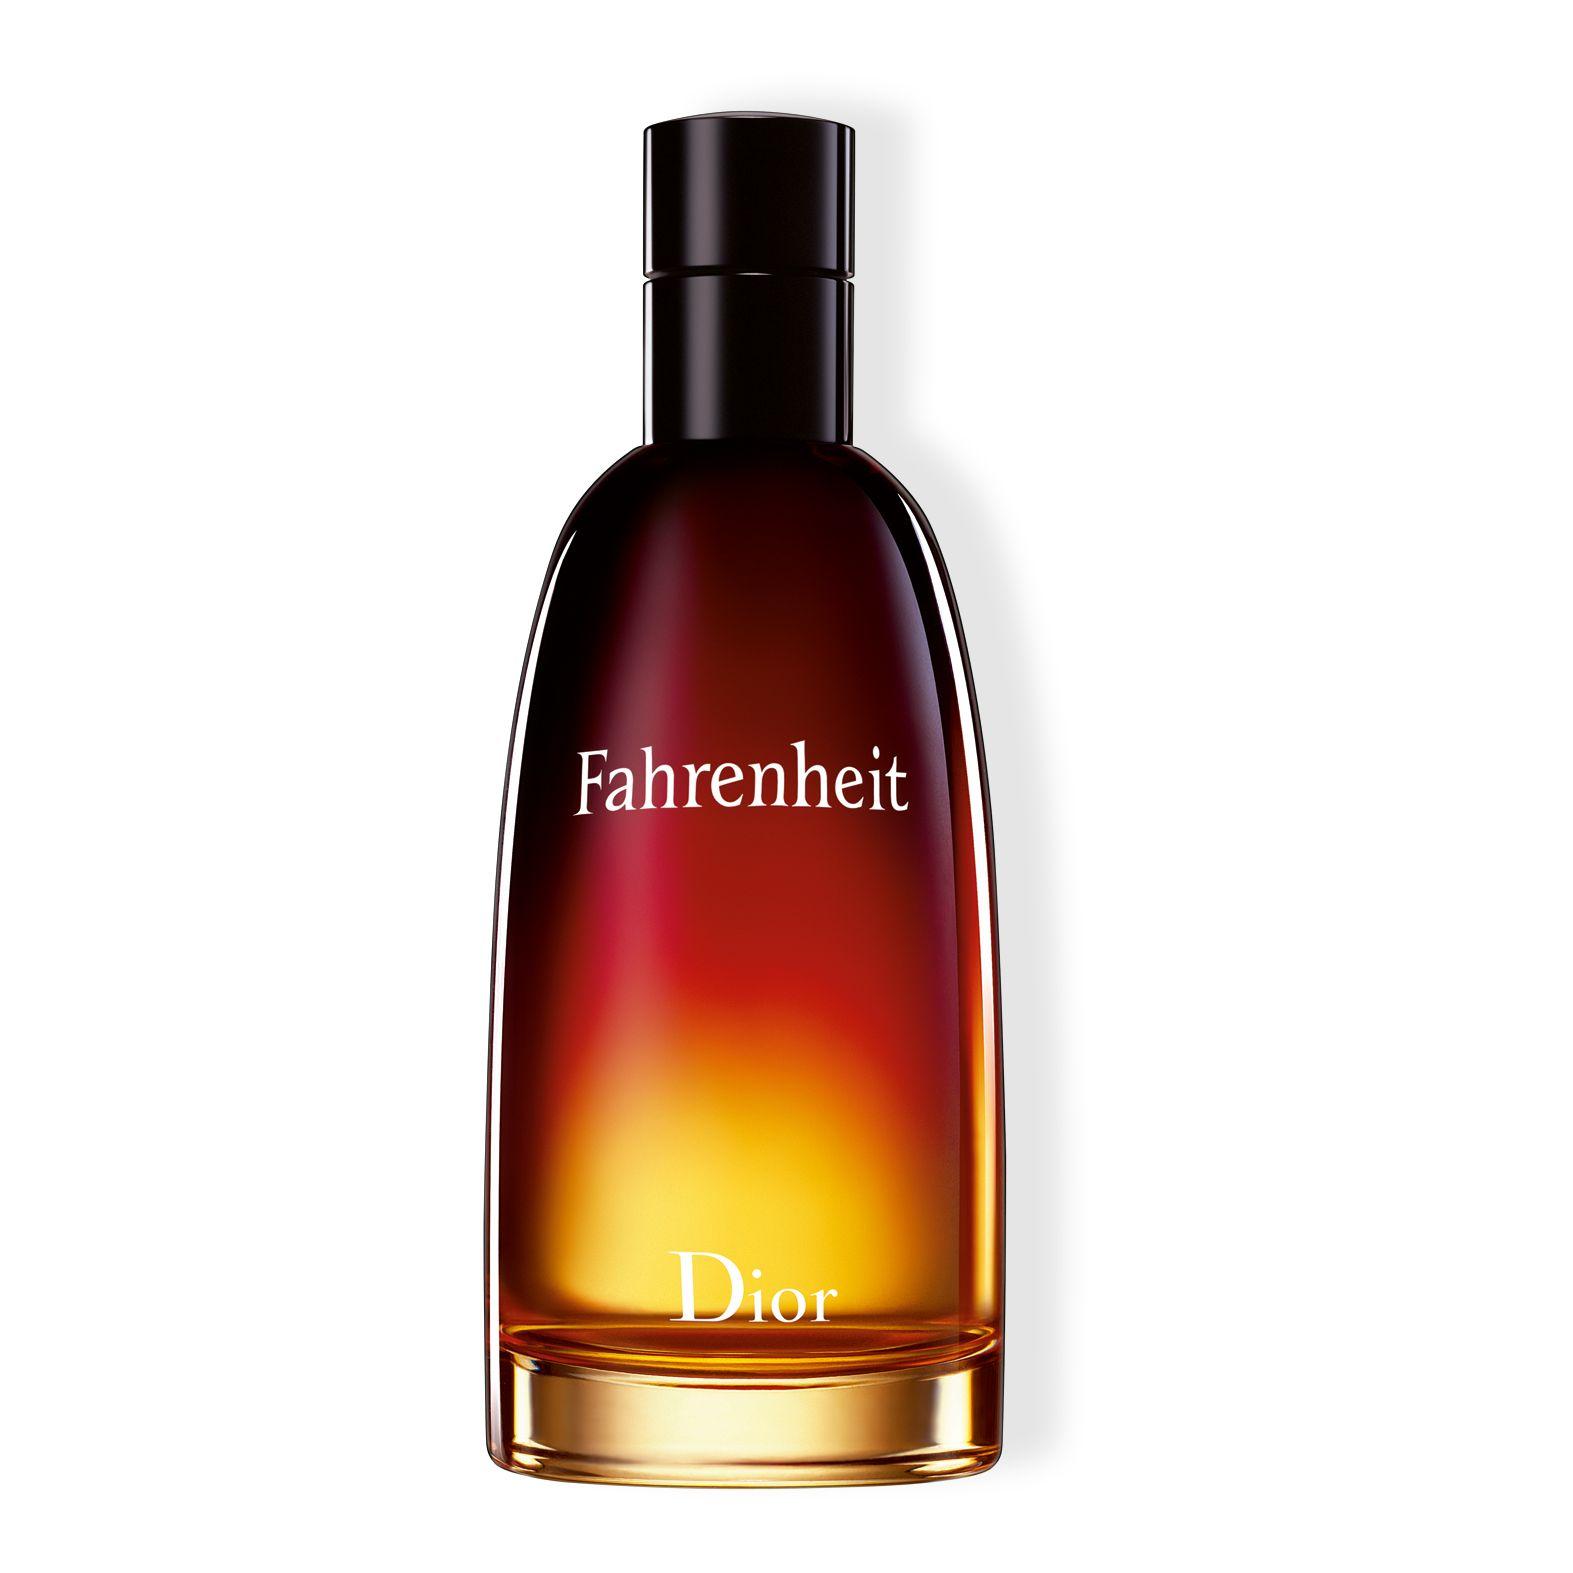 Fahrenheit, Eau de Toilette de Dior 100 ml.